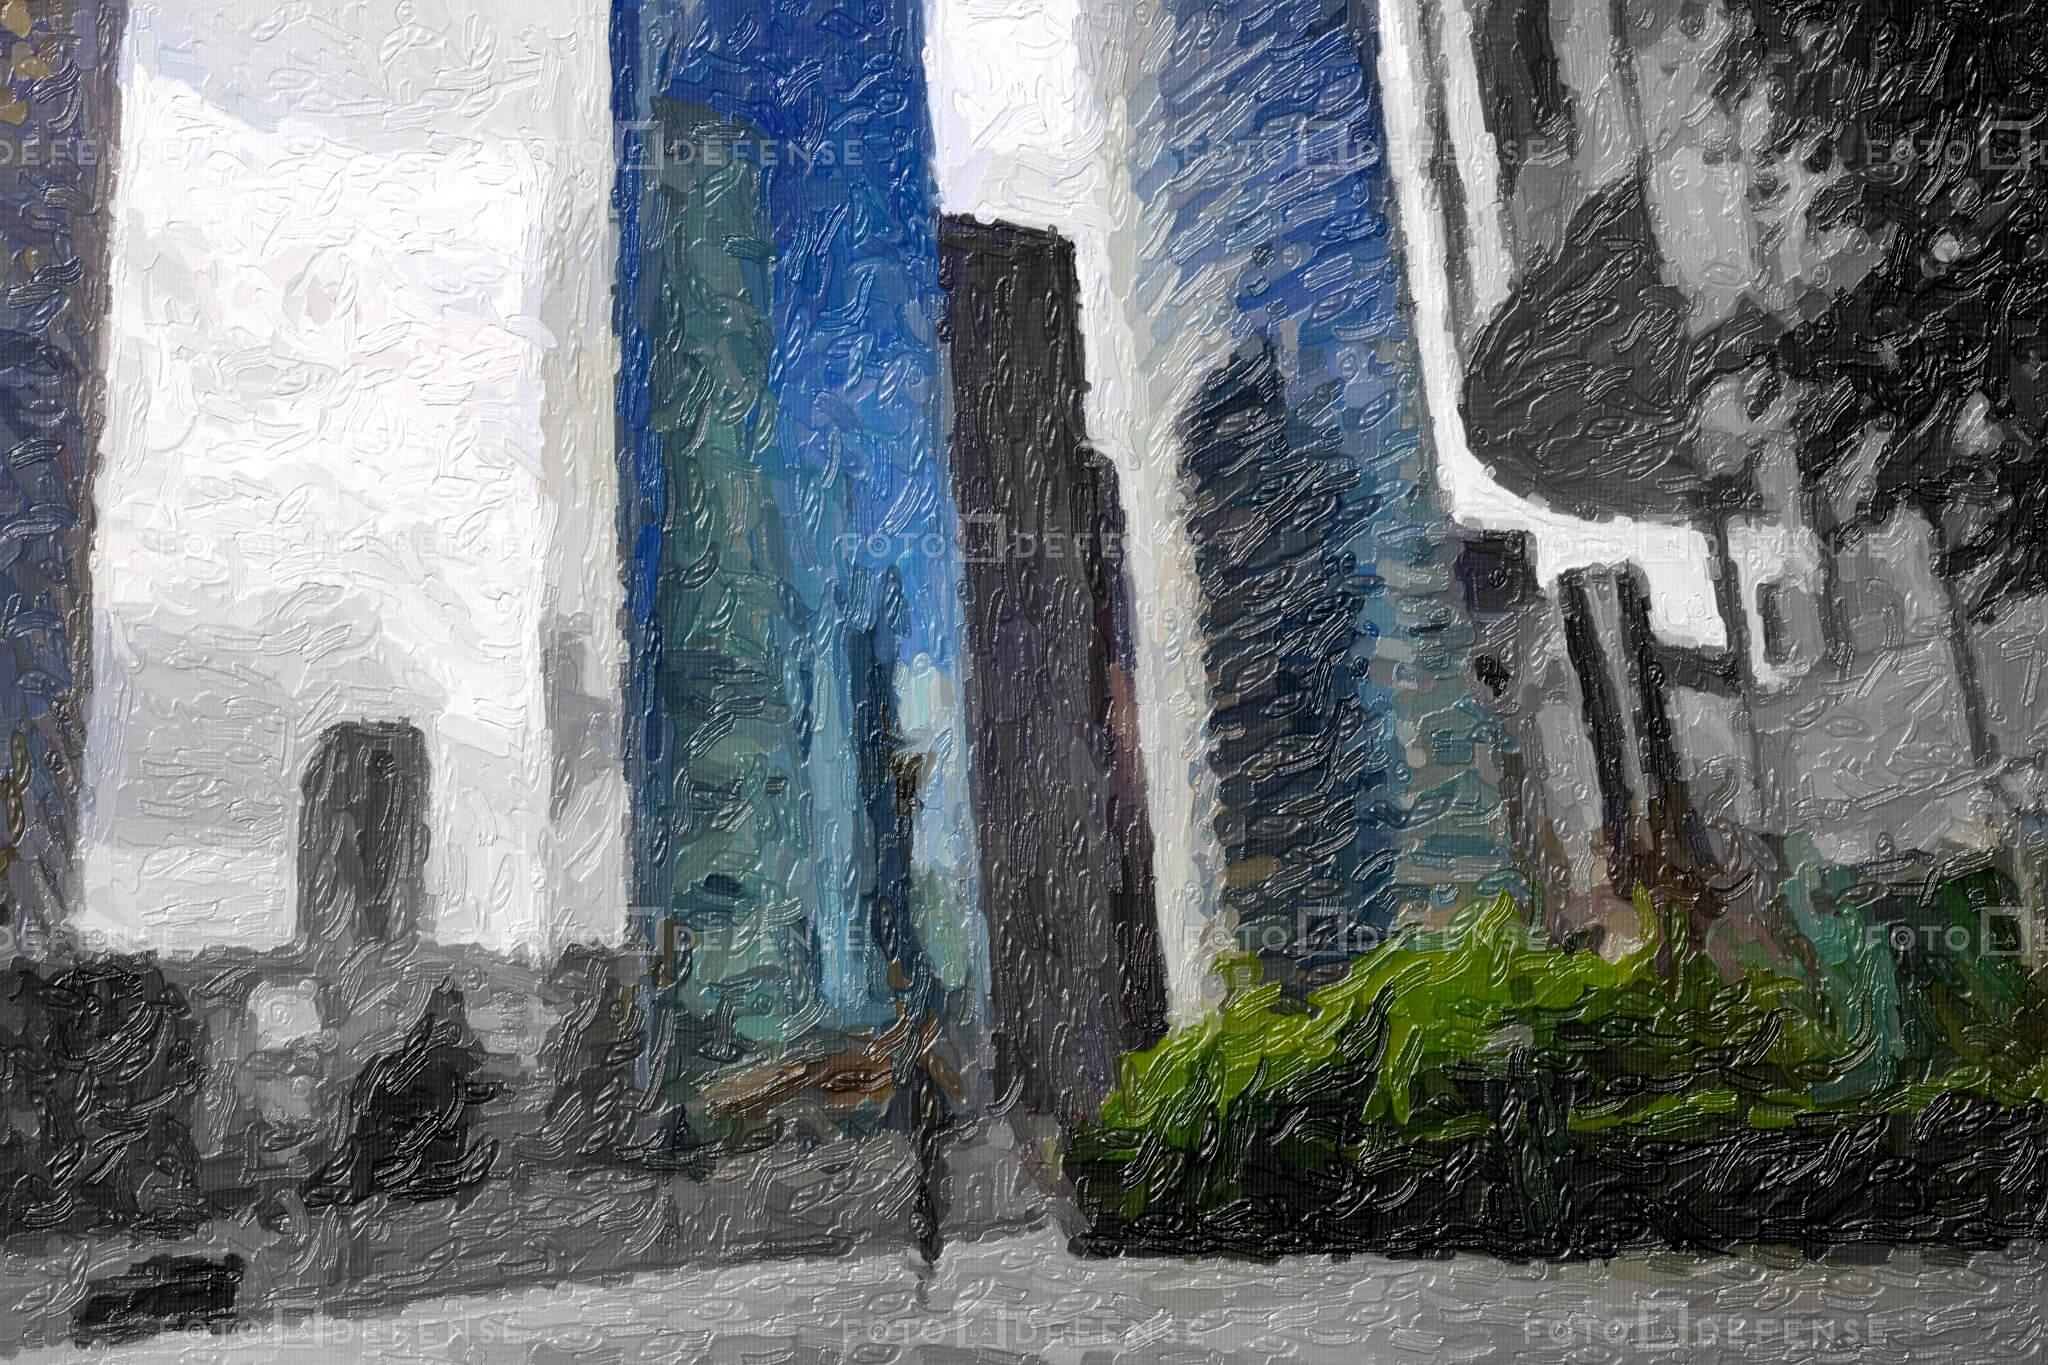 photos d'architecture impressioniste